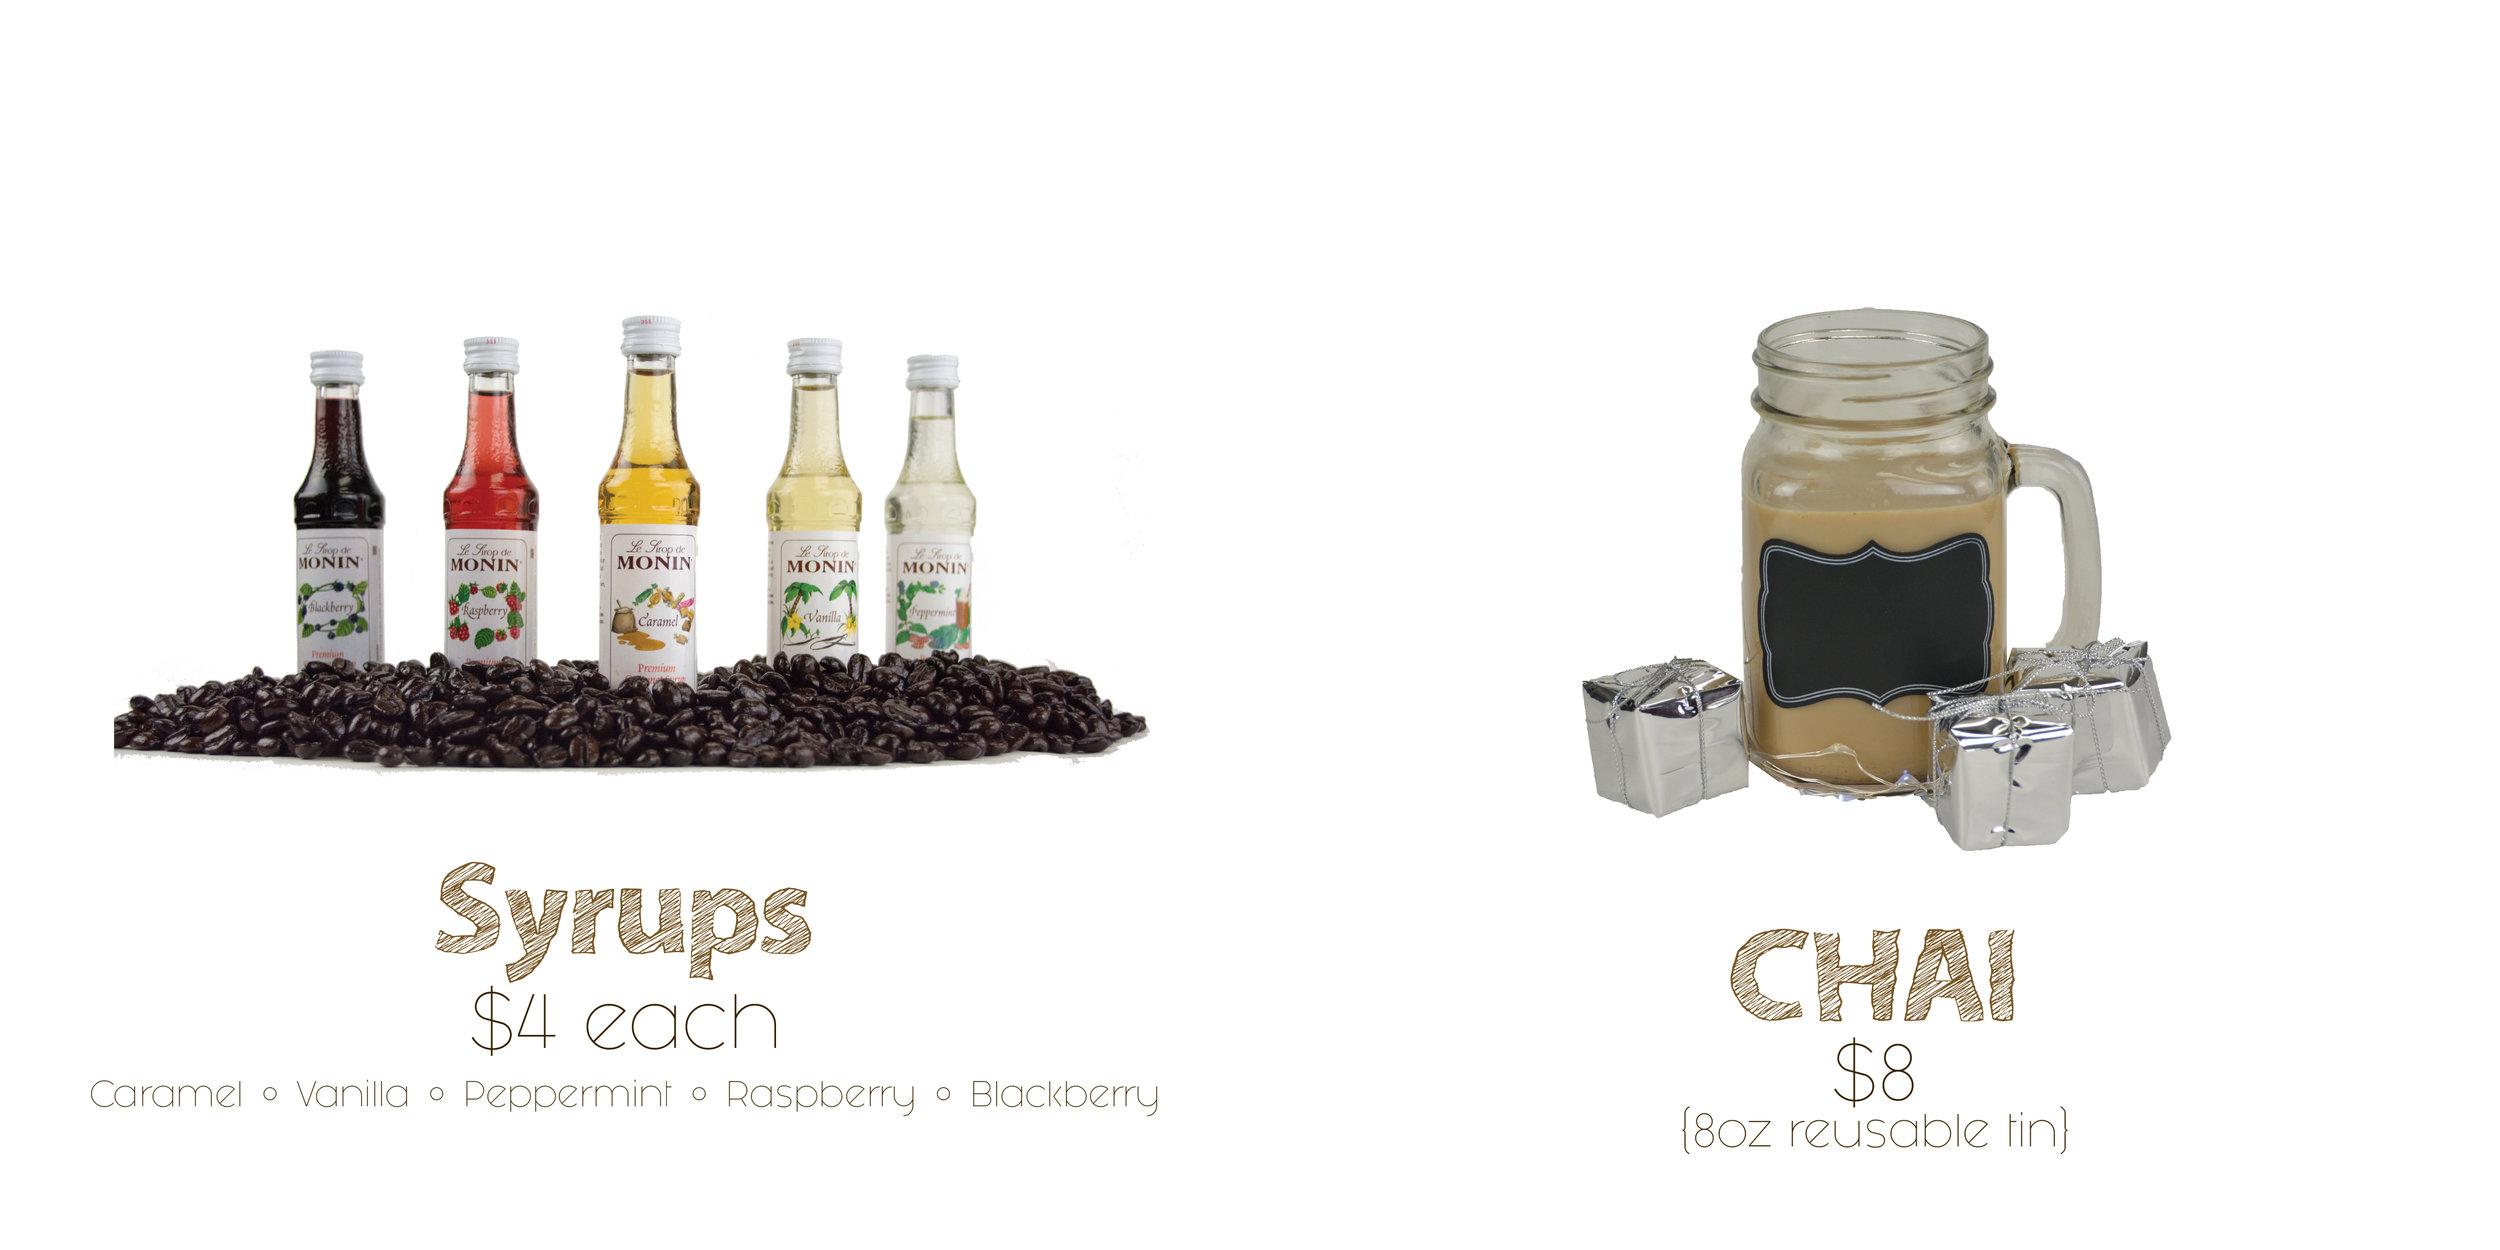 Bruggeman_Coffee Catolog5.jpg